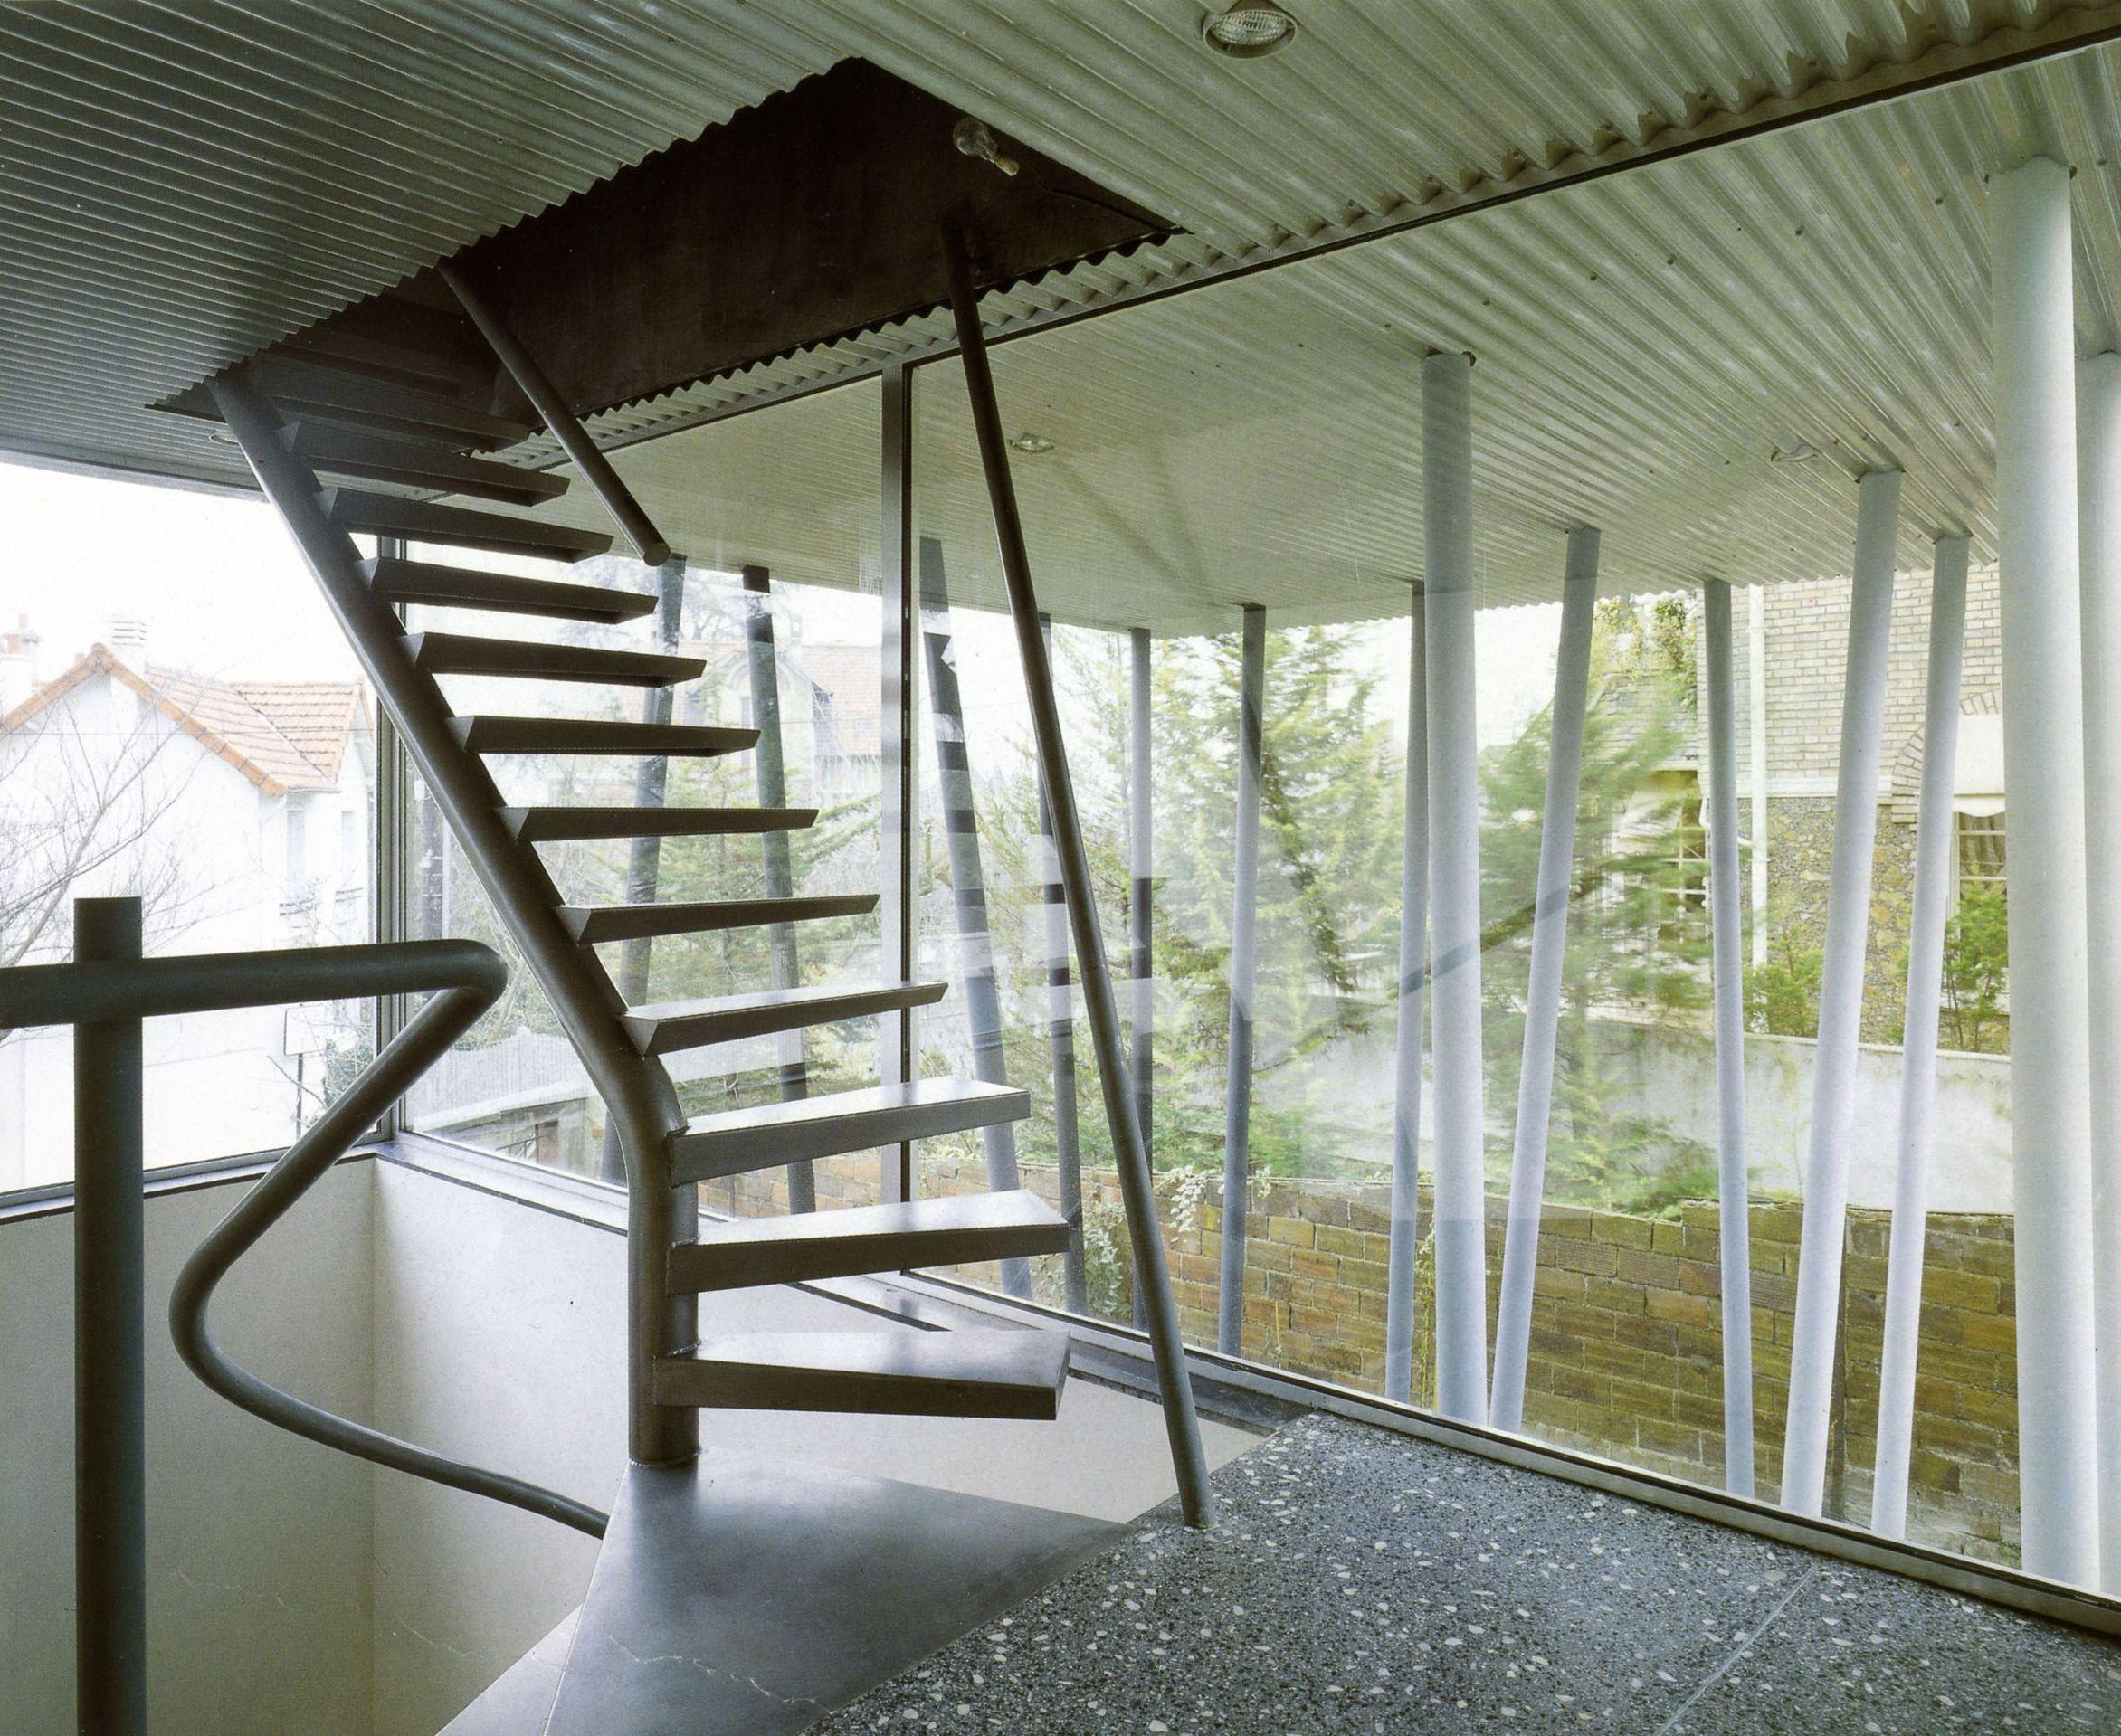 Rem koolhaas villa dall ava paris france 1991 atlas of - Villa Dall Ava West Google Arquitectura H Pinterest Rem Koolhaas And Architecture